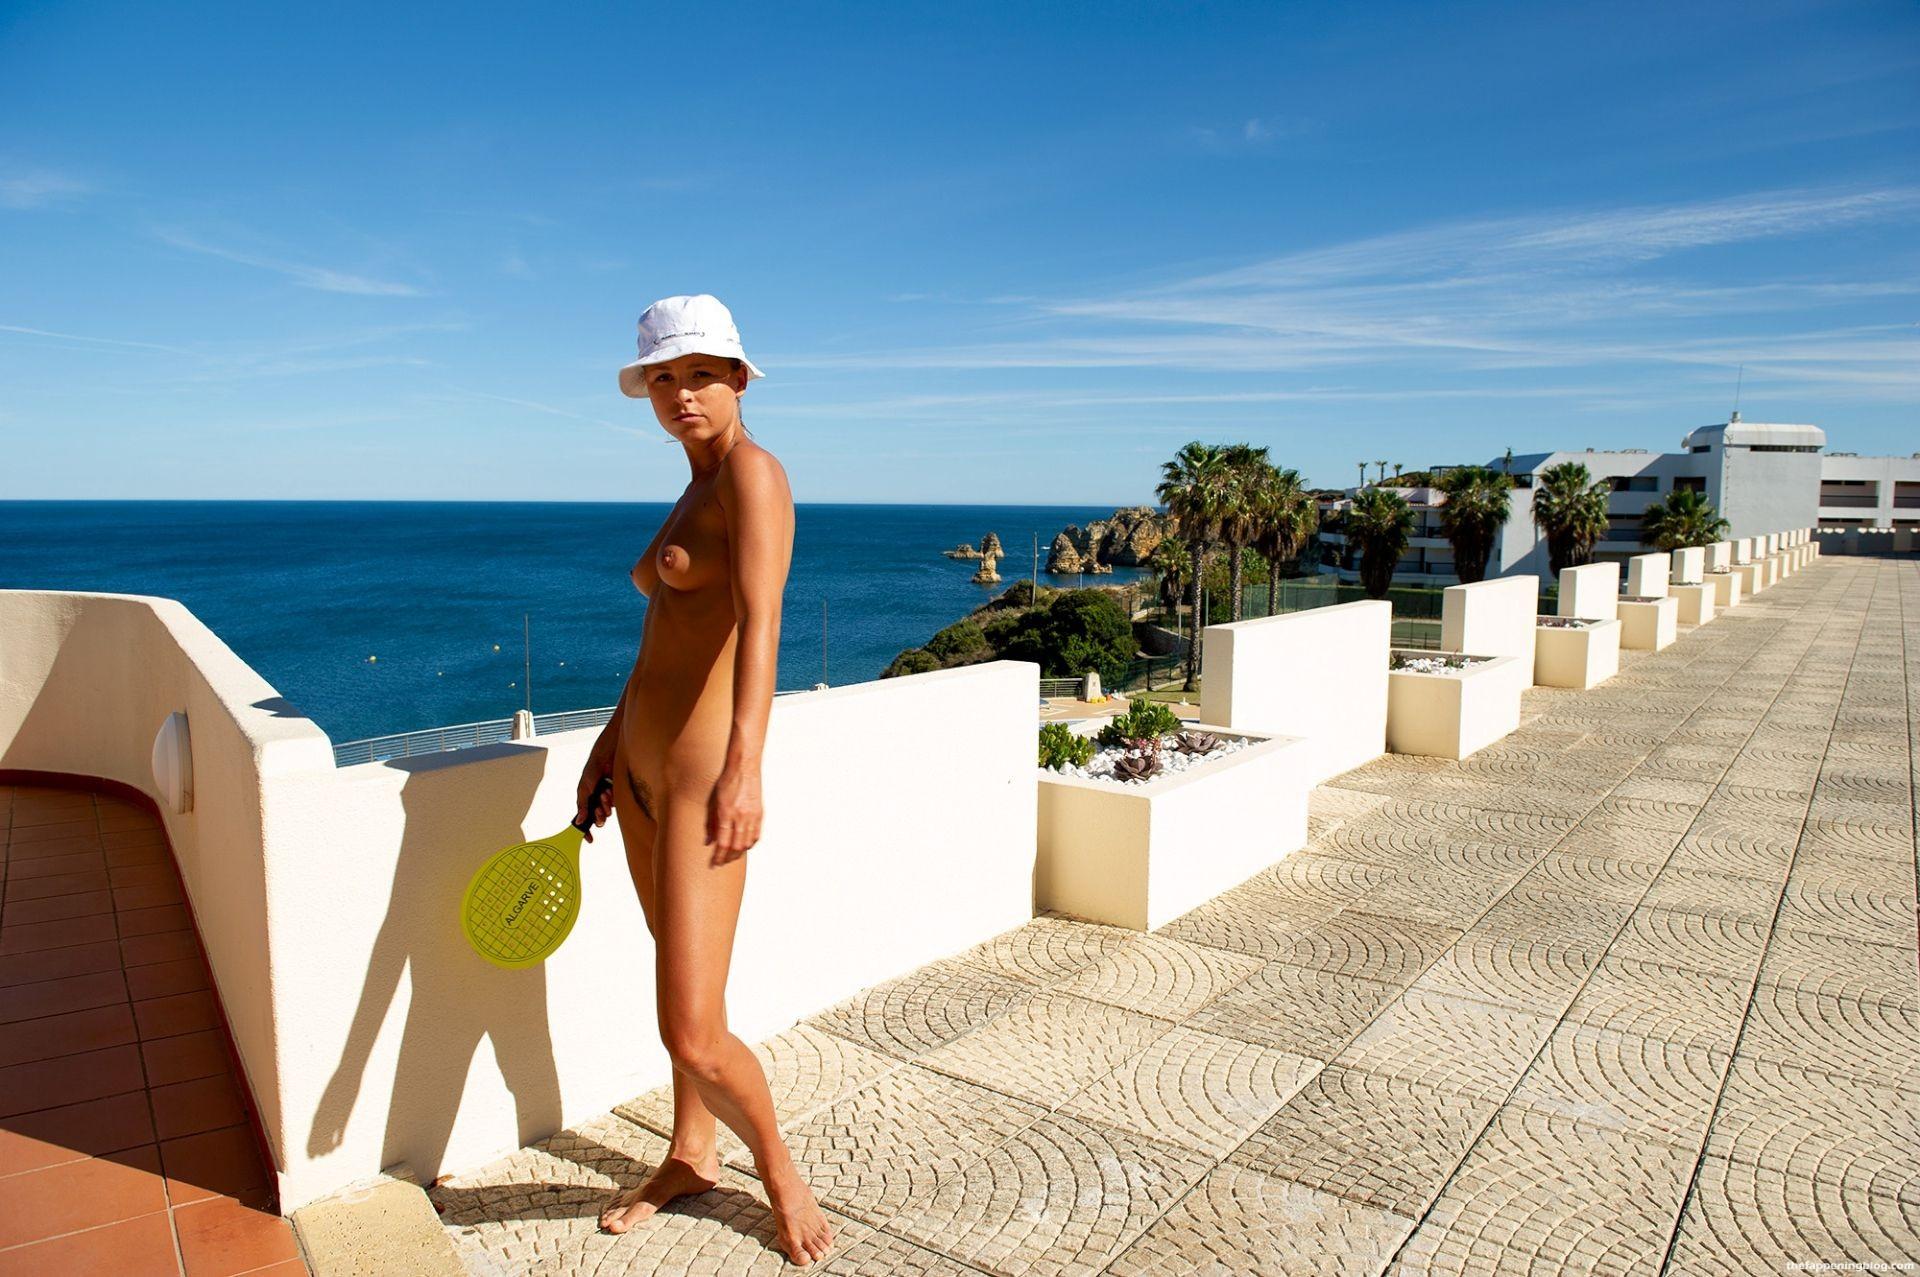 Marisa-Papen-Naked-13-thefappeningblog.com1_.jpg